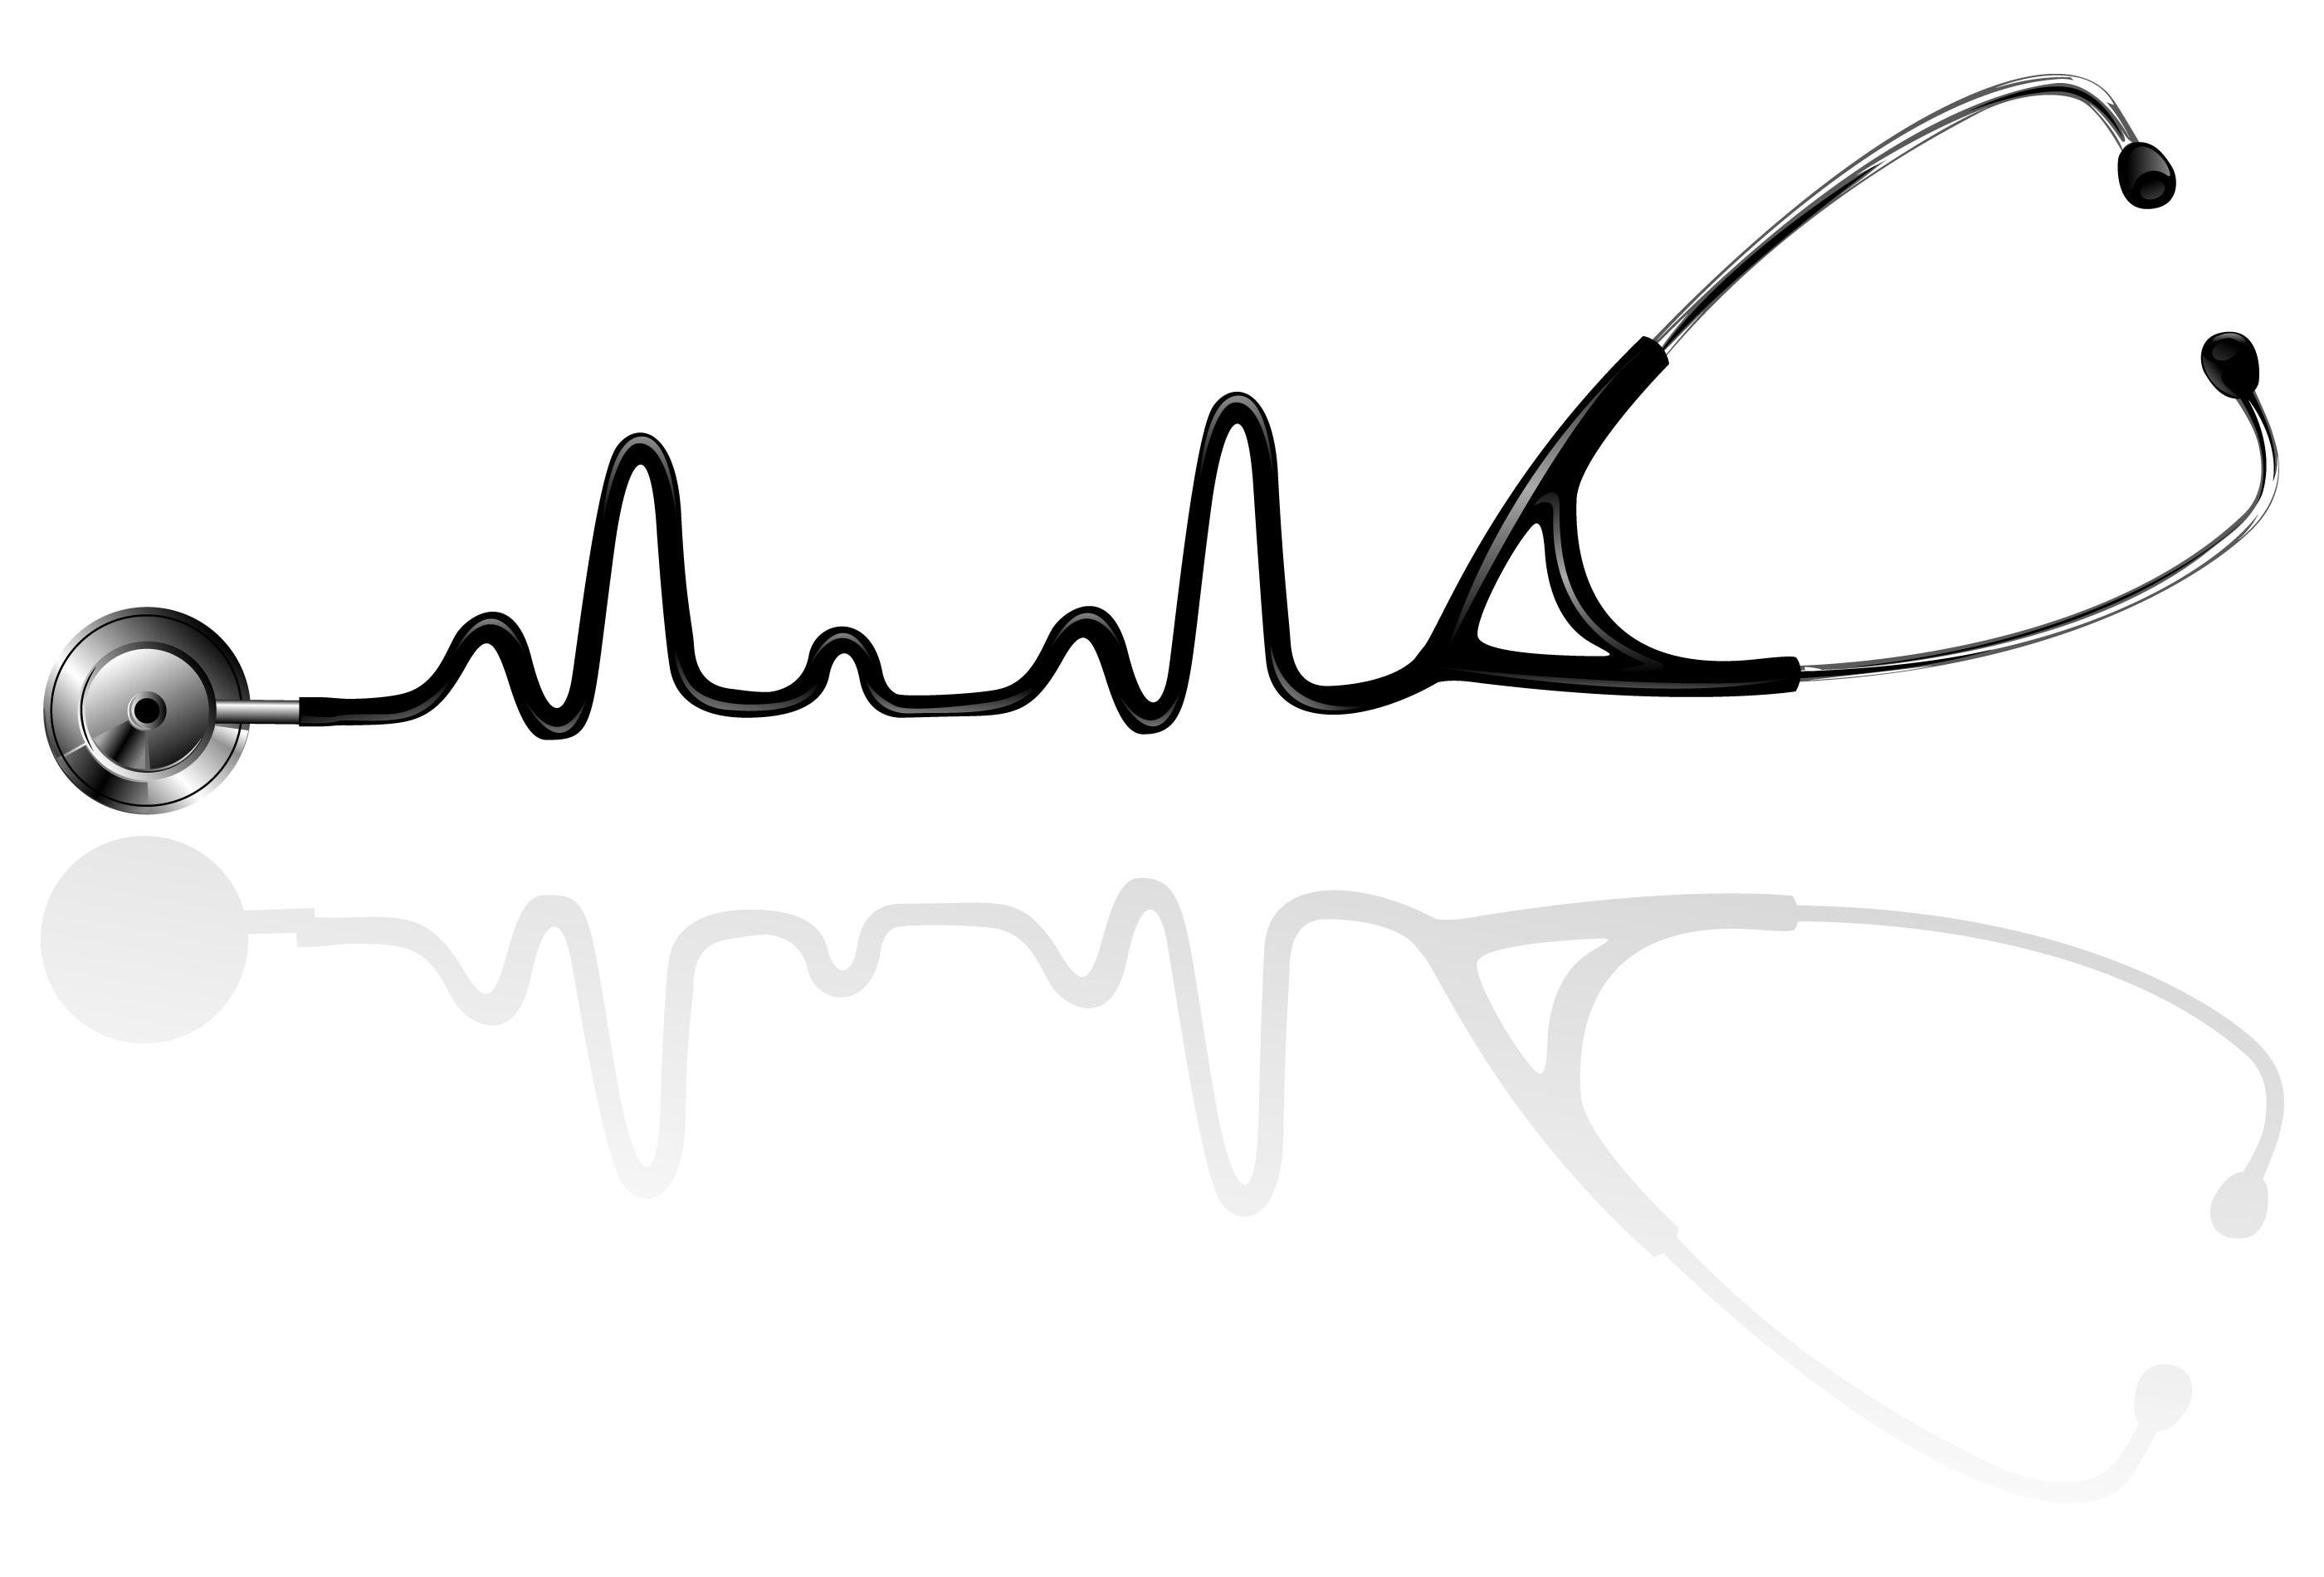 medical wallpaper black: Medical Wallpaper ·① Download Free Cool HD Backgrounds For